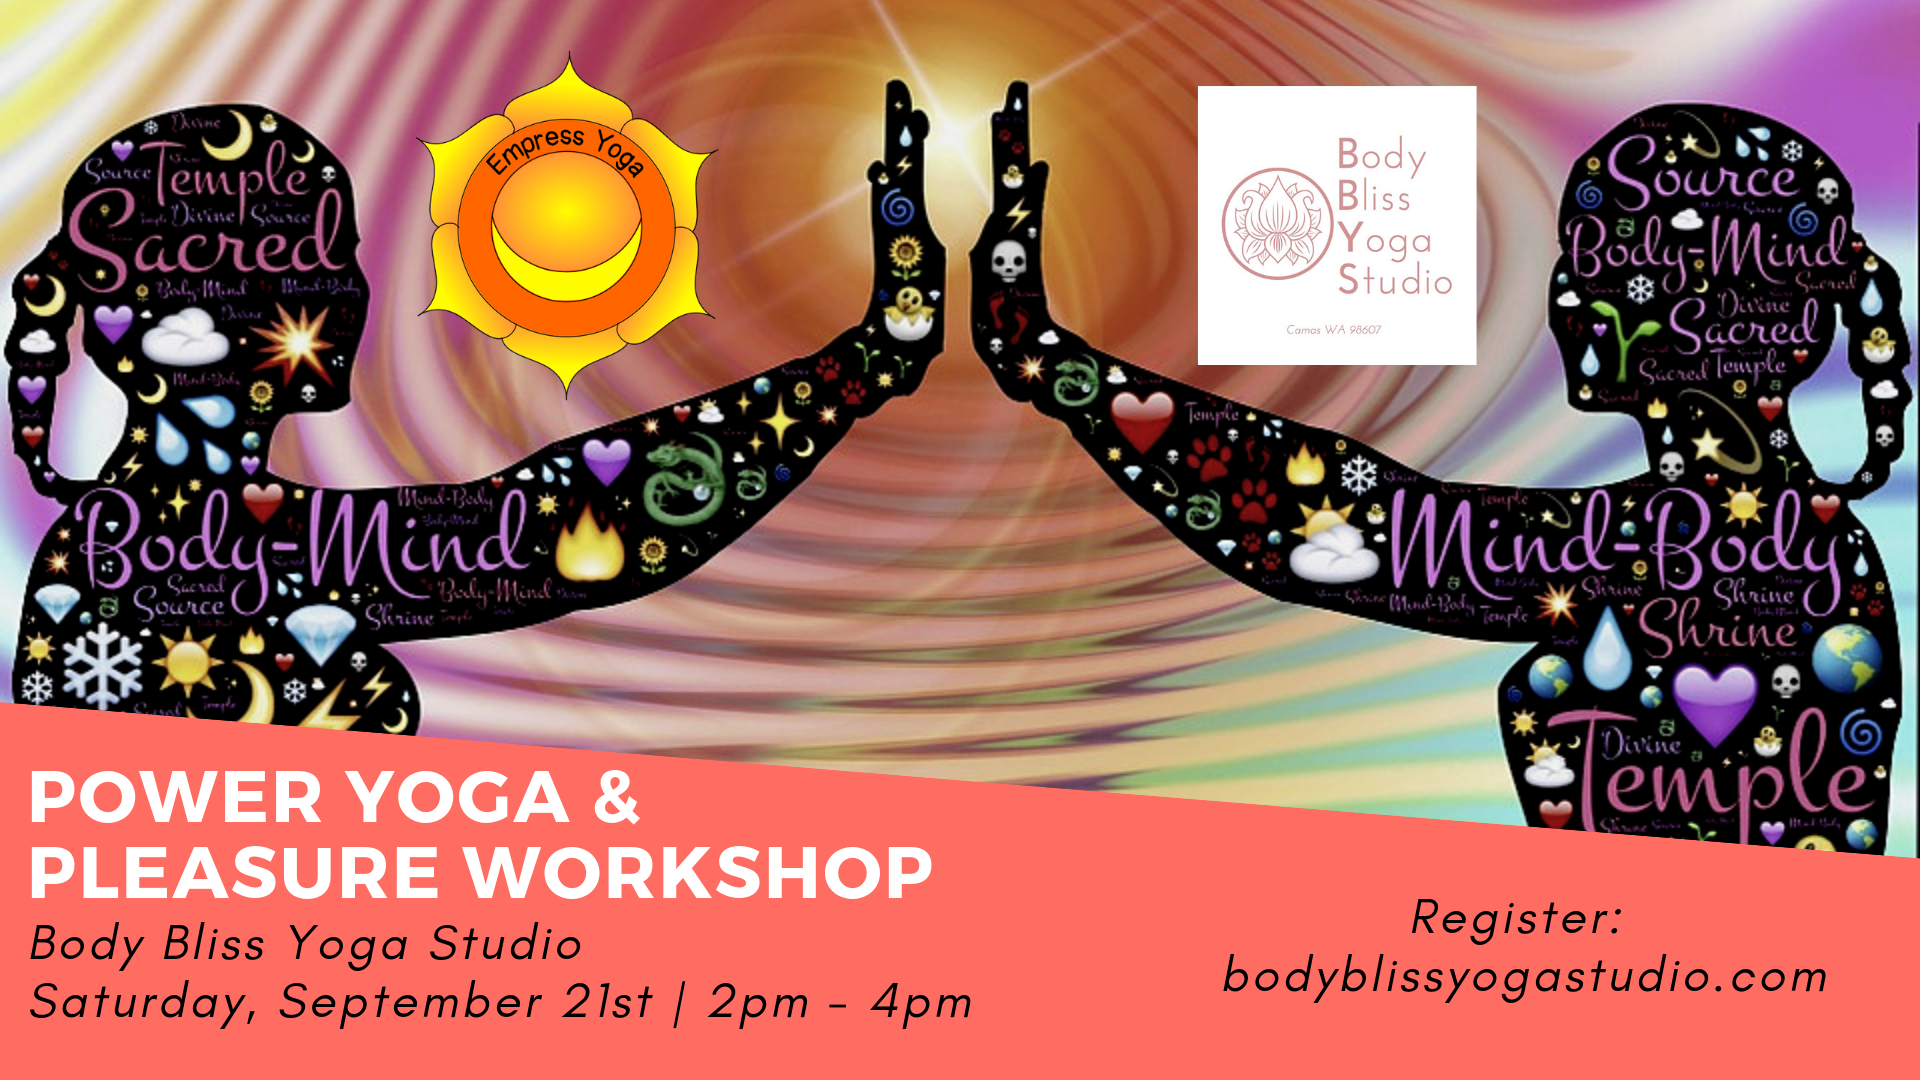 Power Yoga & Pleasure Workshop, empress yoga, camas, wa, body bliss yoga studio